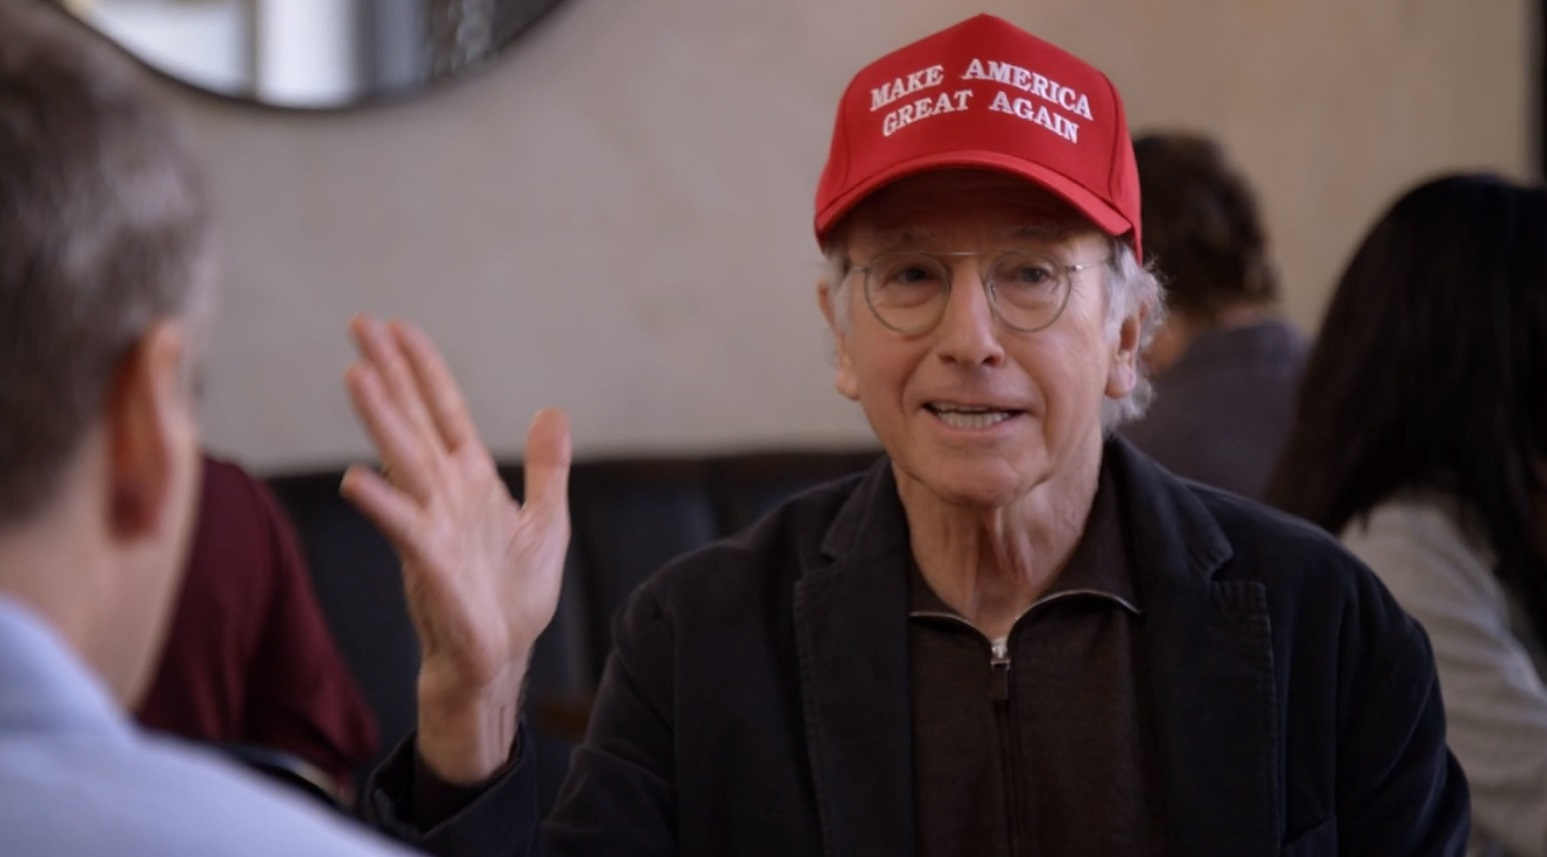 PHOTO Larry David Wearing A Make America Great Again Hat